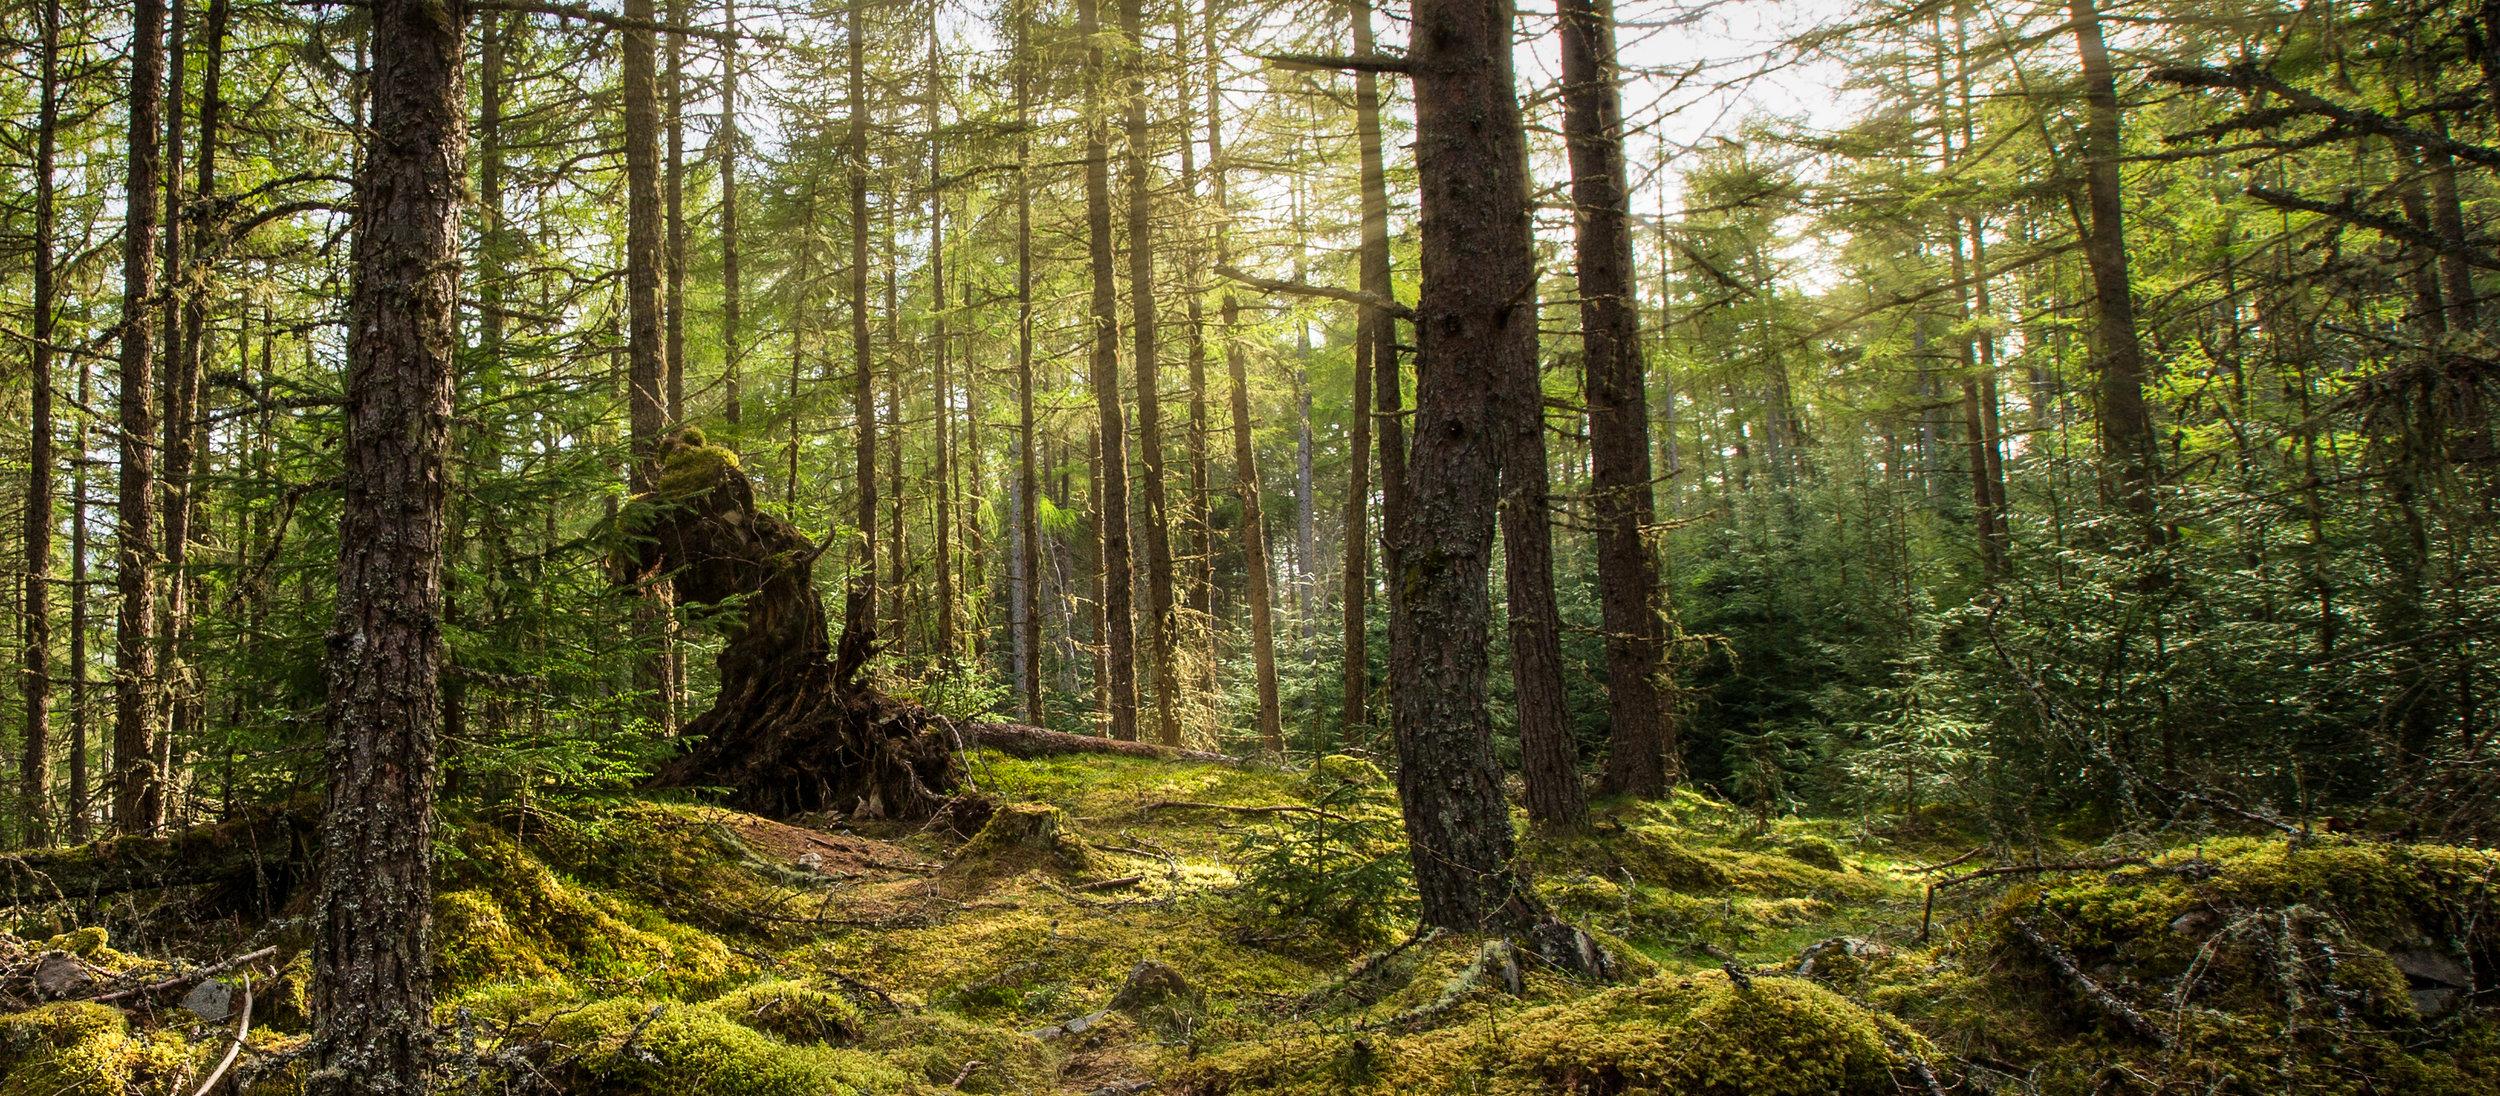 scotland woodland cairngorms national park 2015 © jennifer bailey